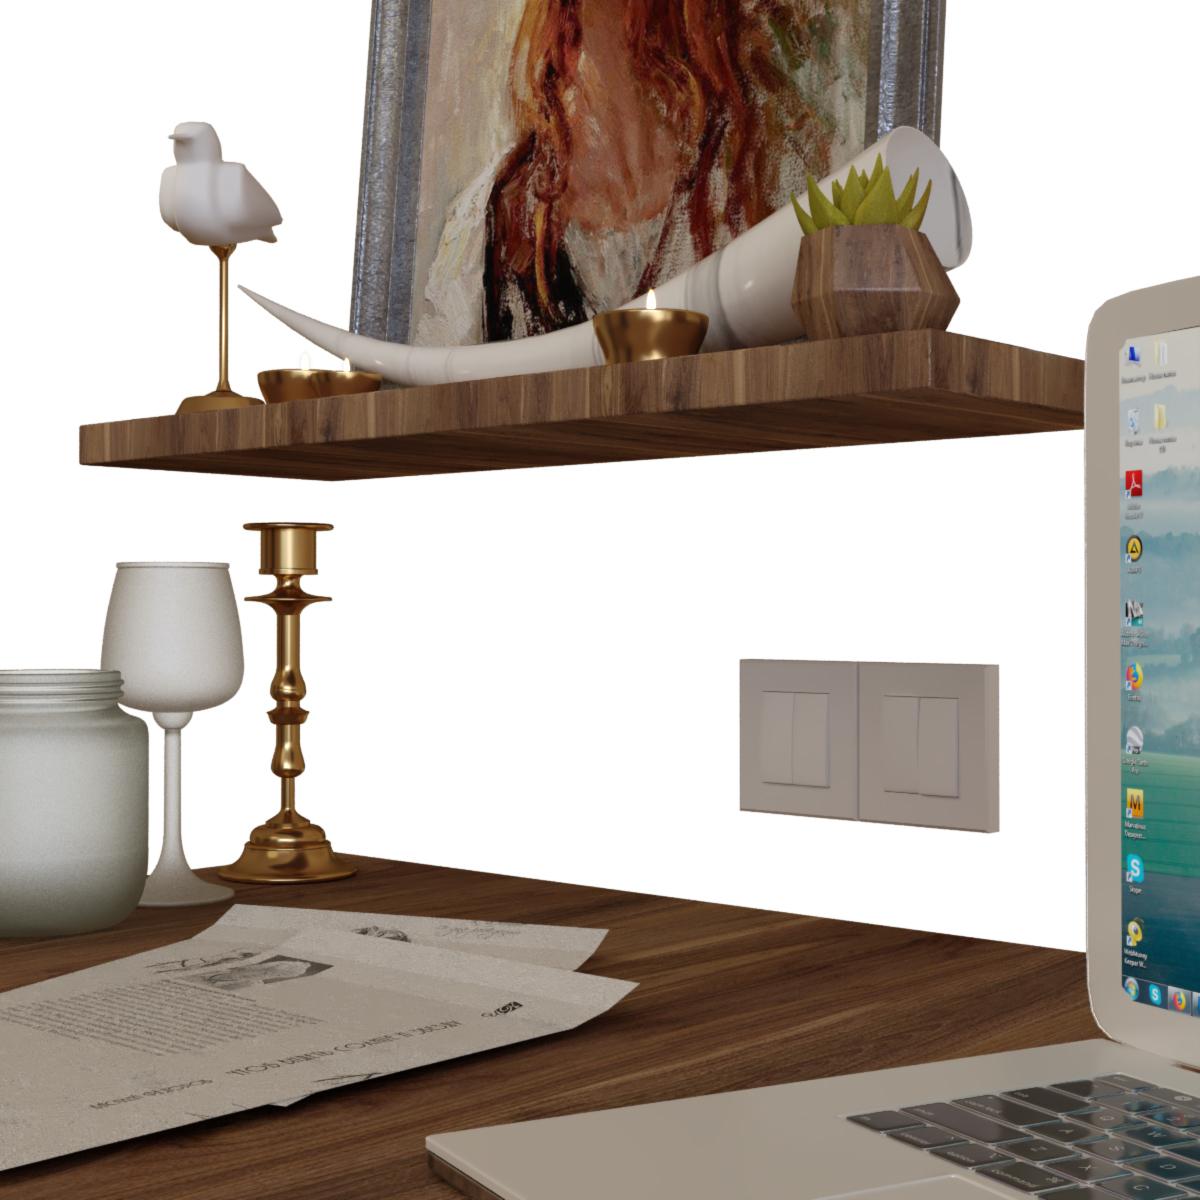 3.jpg Download STL file work table 3 • 3D printer design, unisjamavari